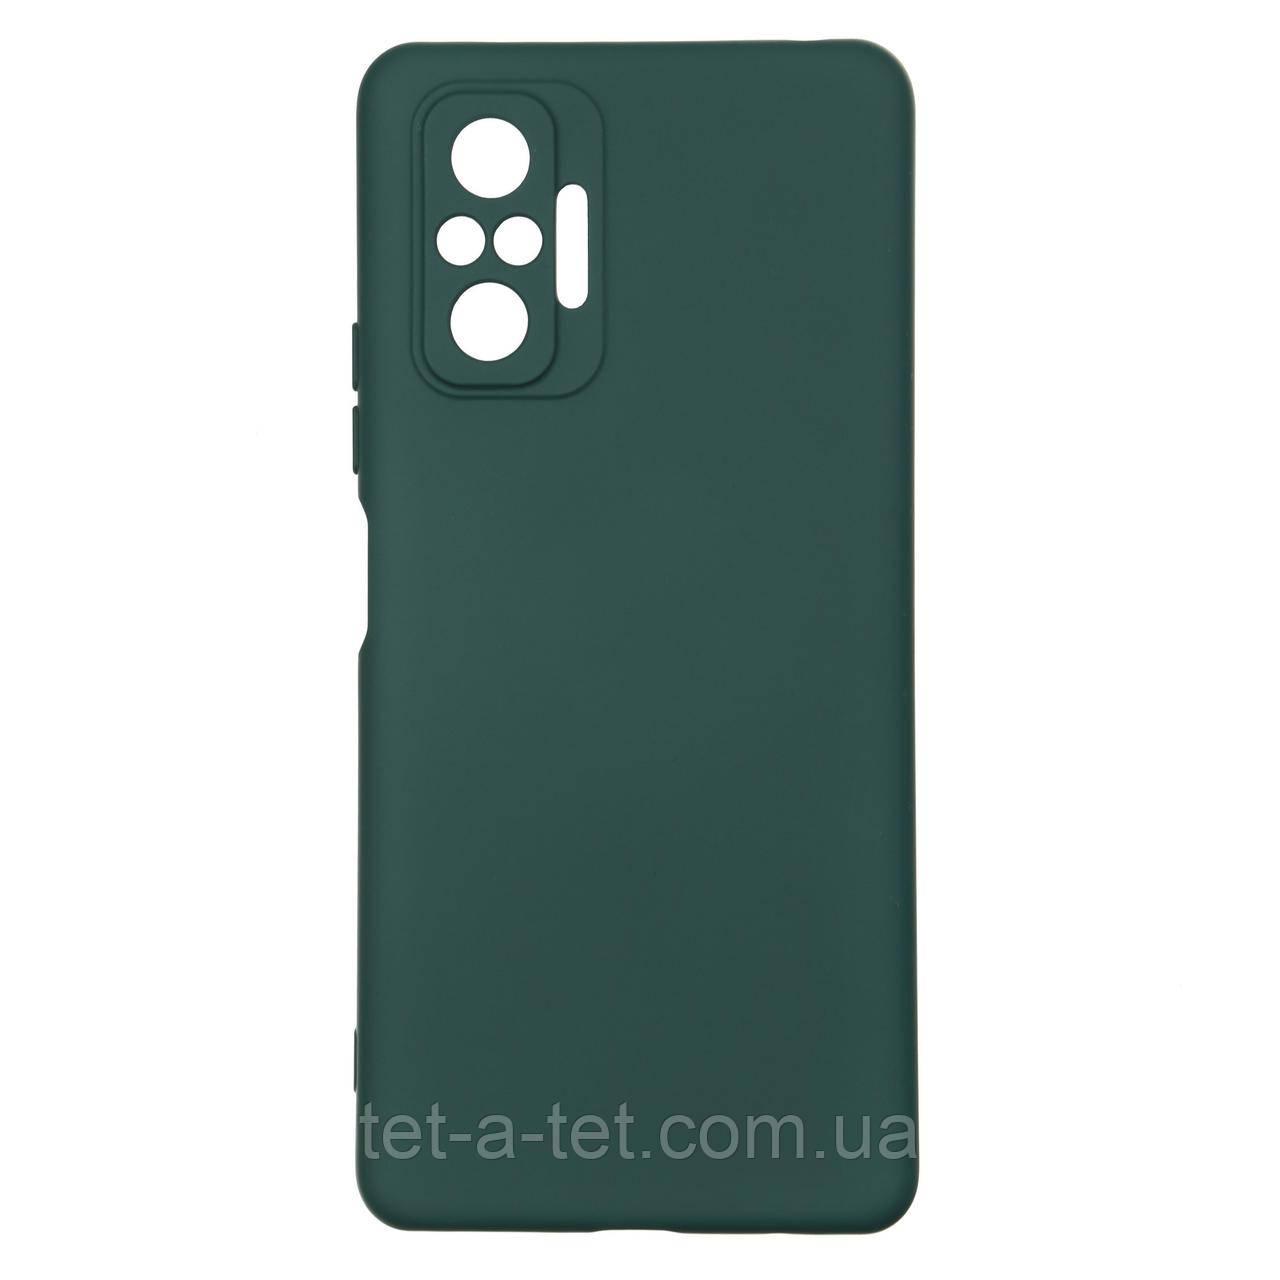 Чохол силіконовий ArmorStandart ICON Case for Xiaomi Redmi Note Pro 10 Pine Green